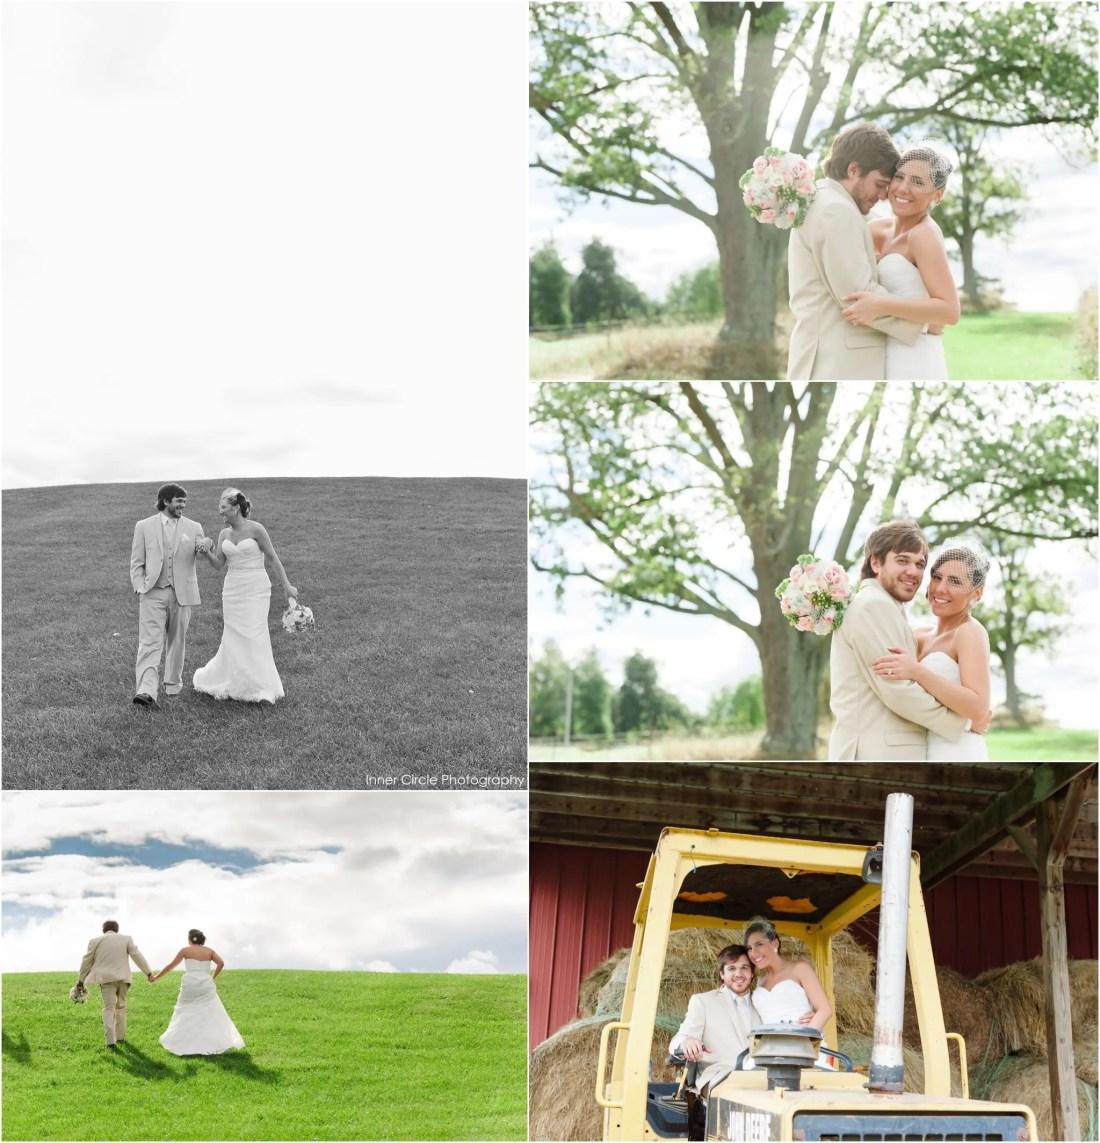 justinbrandyWED301 Brandy and Justin MARRIED! Upland Hills Farm Wedding